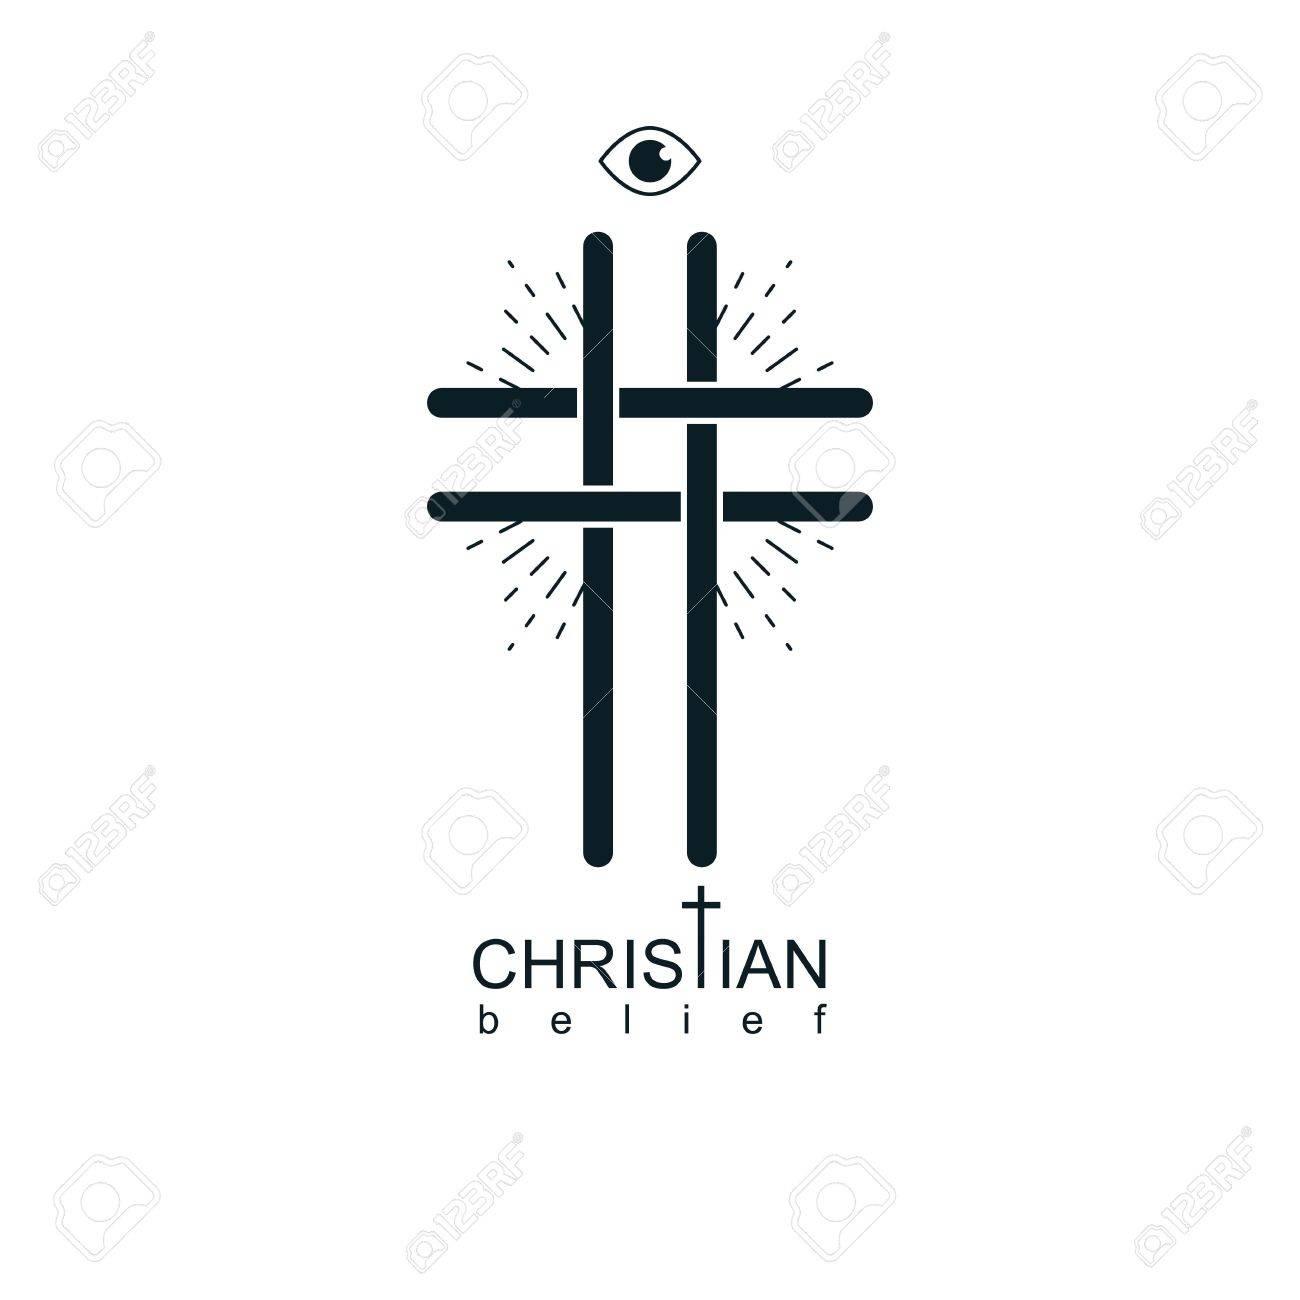 Christian cross true belief vector religion symbol christianity christian cross true belief vector religion symbol christianity jesus icon stock vector 72993251 biocorpaavc Gallery